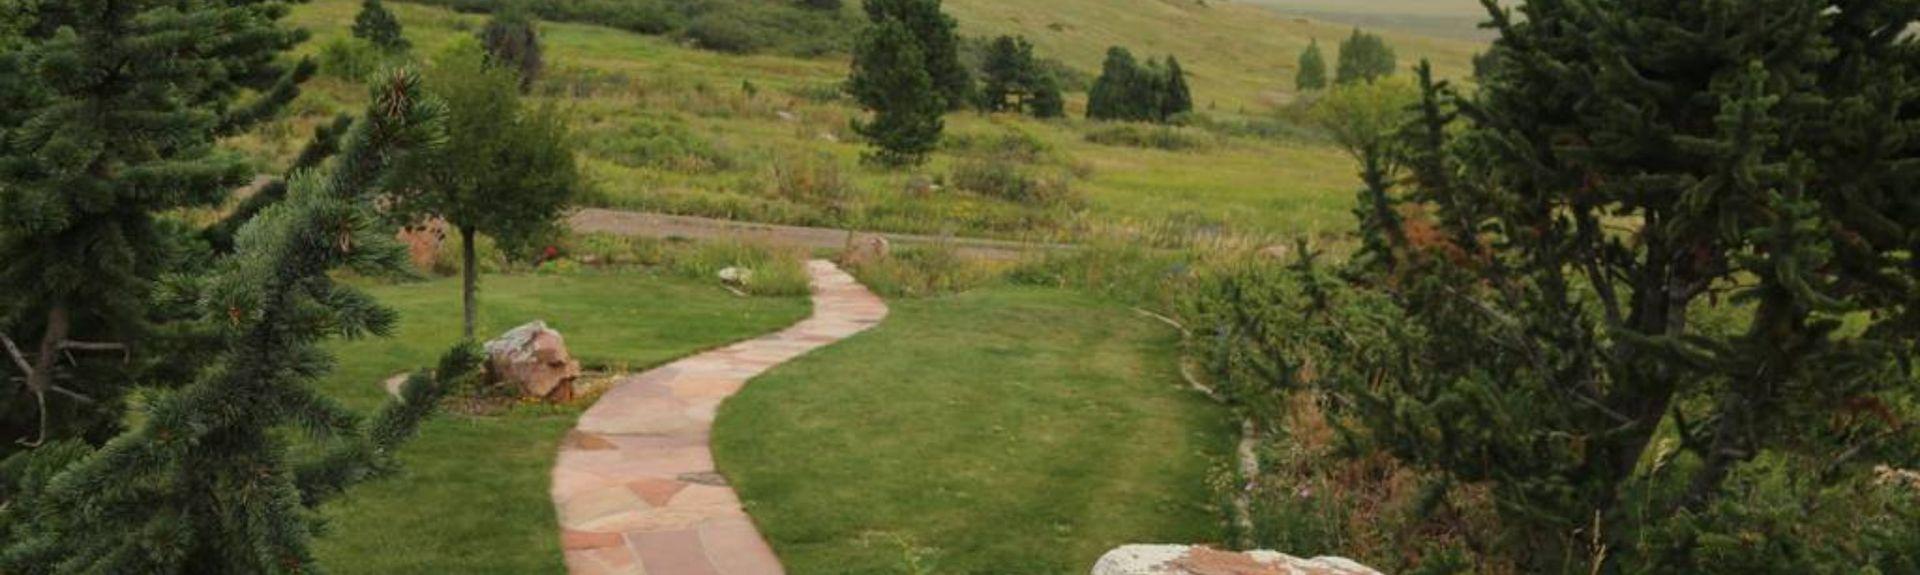 Coal Creek Golf Course, Louisville, Colorado, United States of America